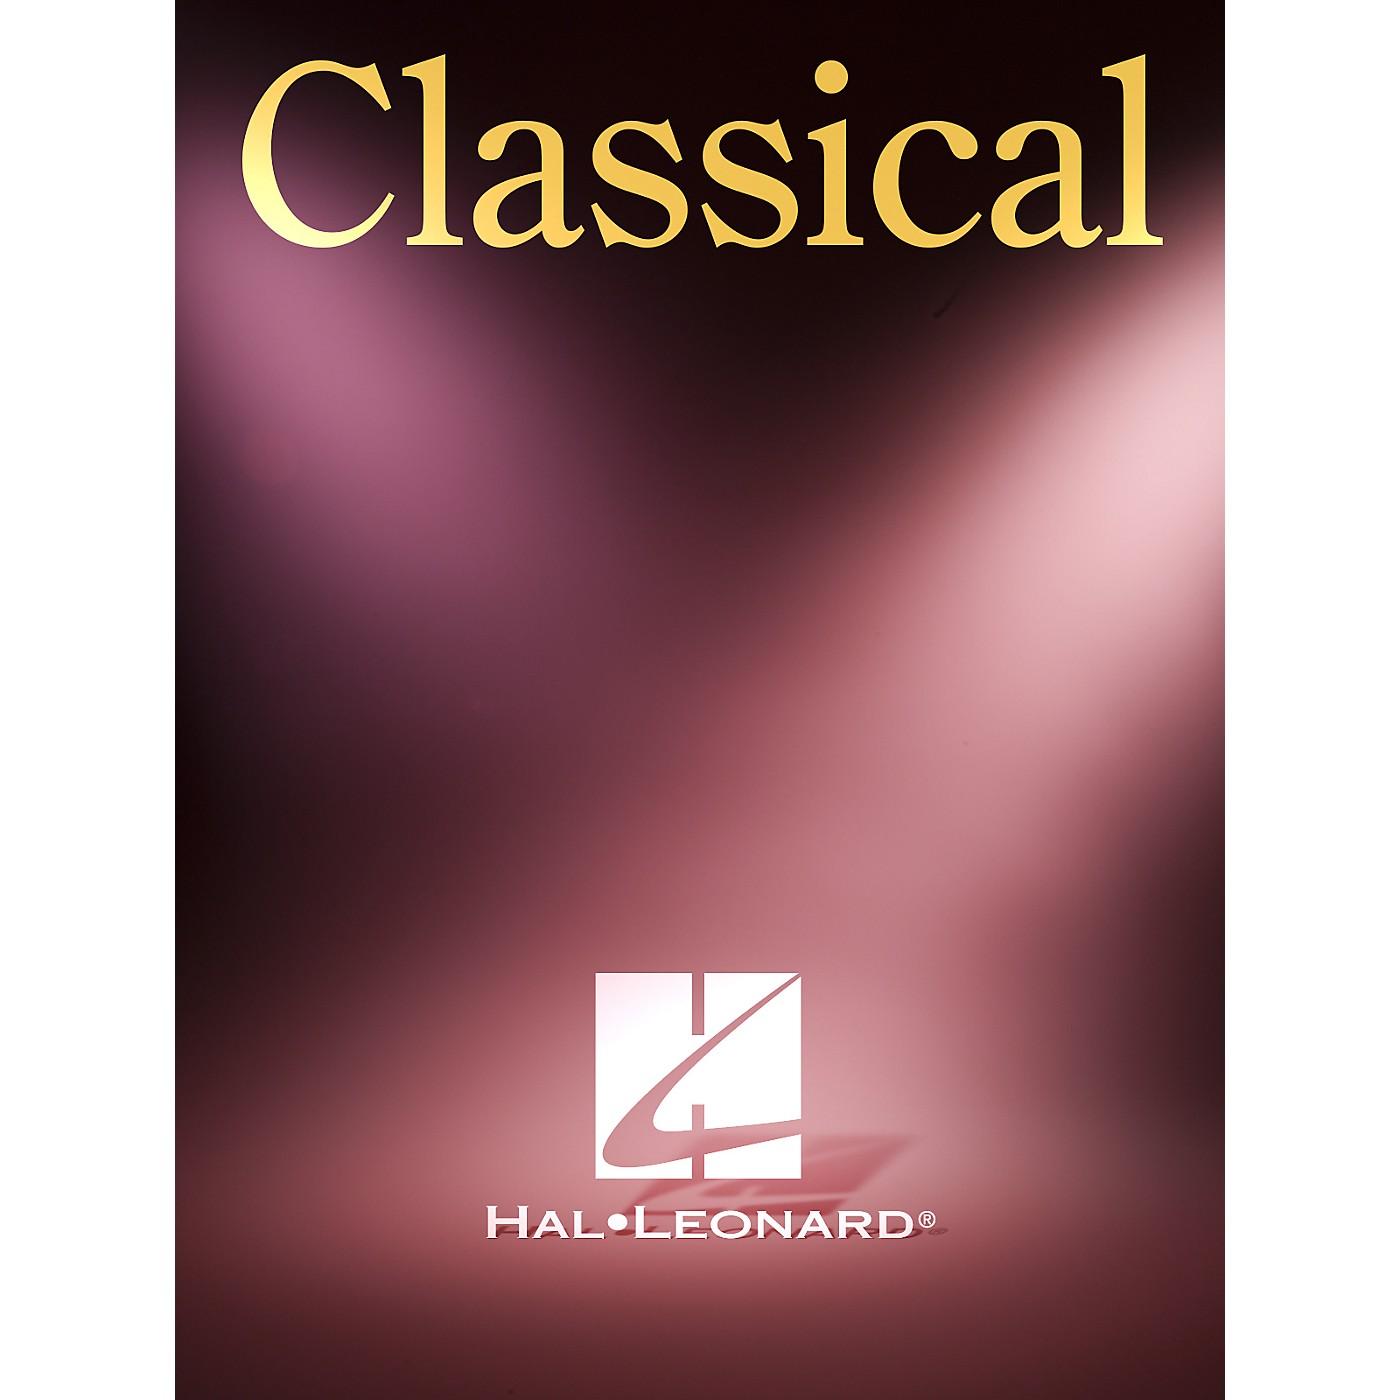 Hal Leonard Porgy & Bess Suite Brass Quintet Complete Set Brass Ensemble Series by G Gershwin thumbnail